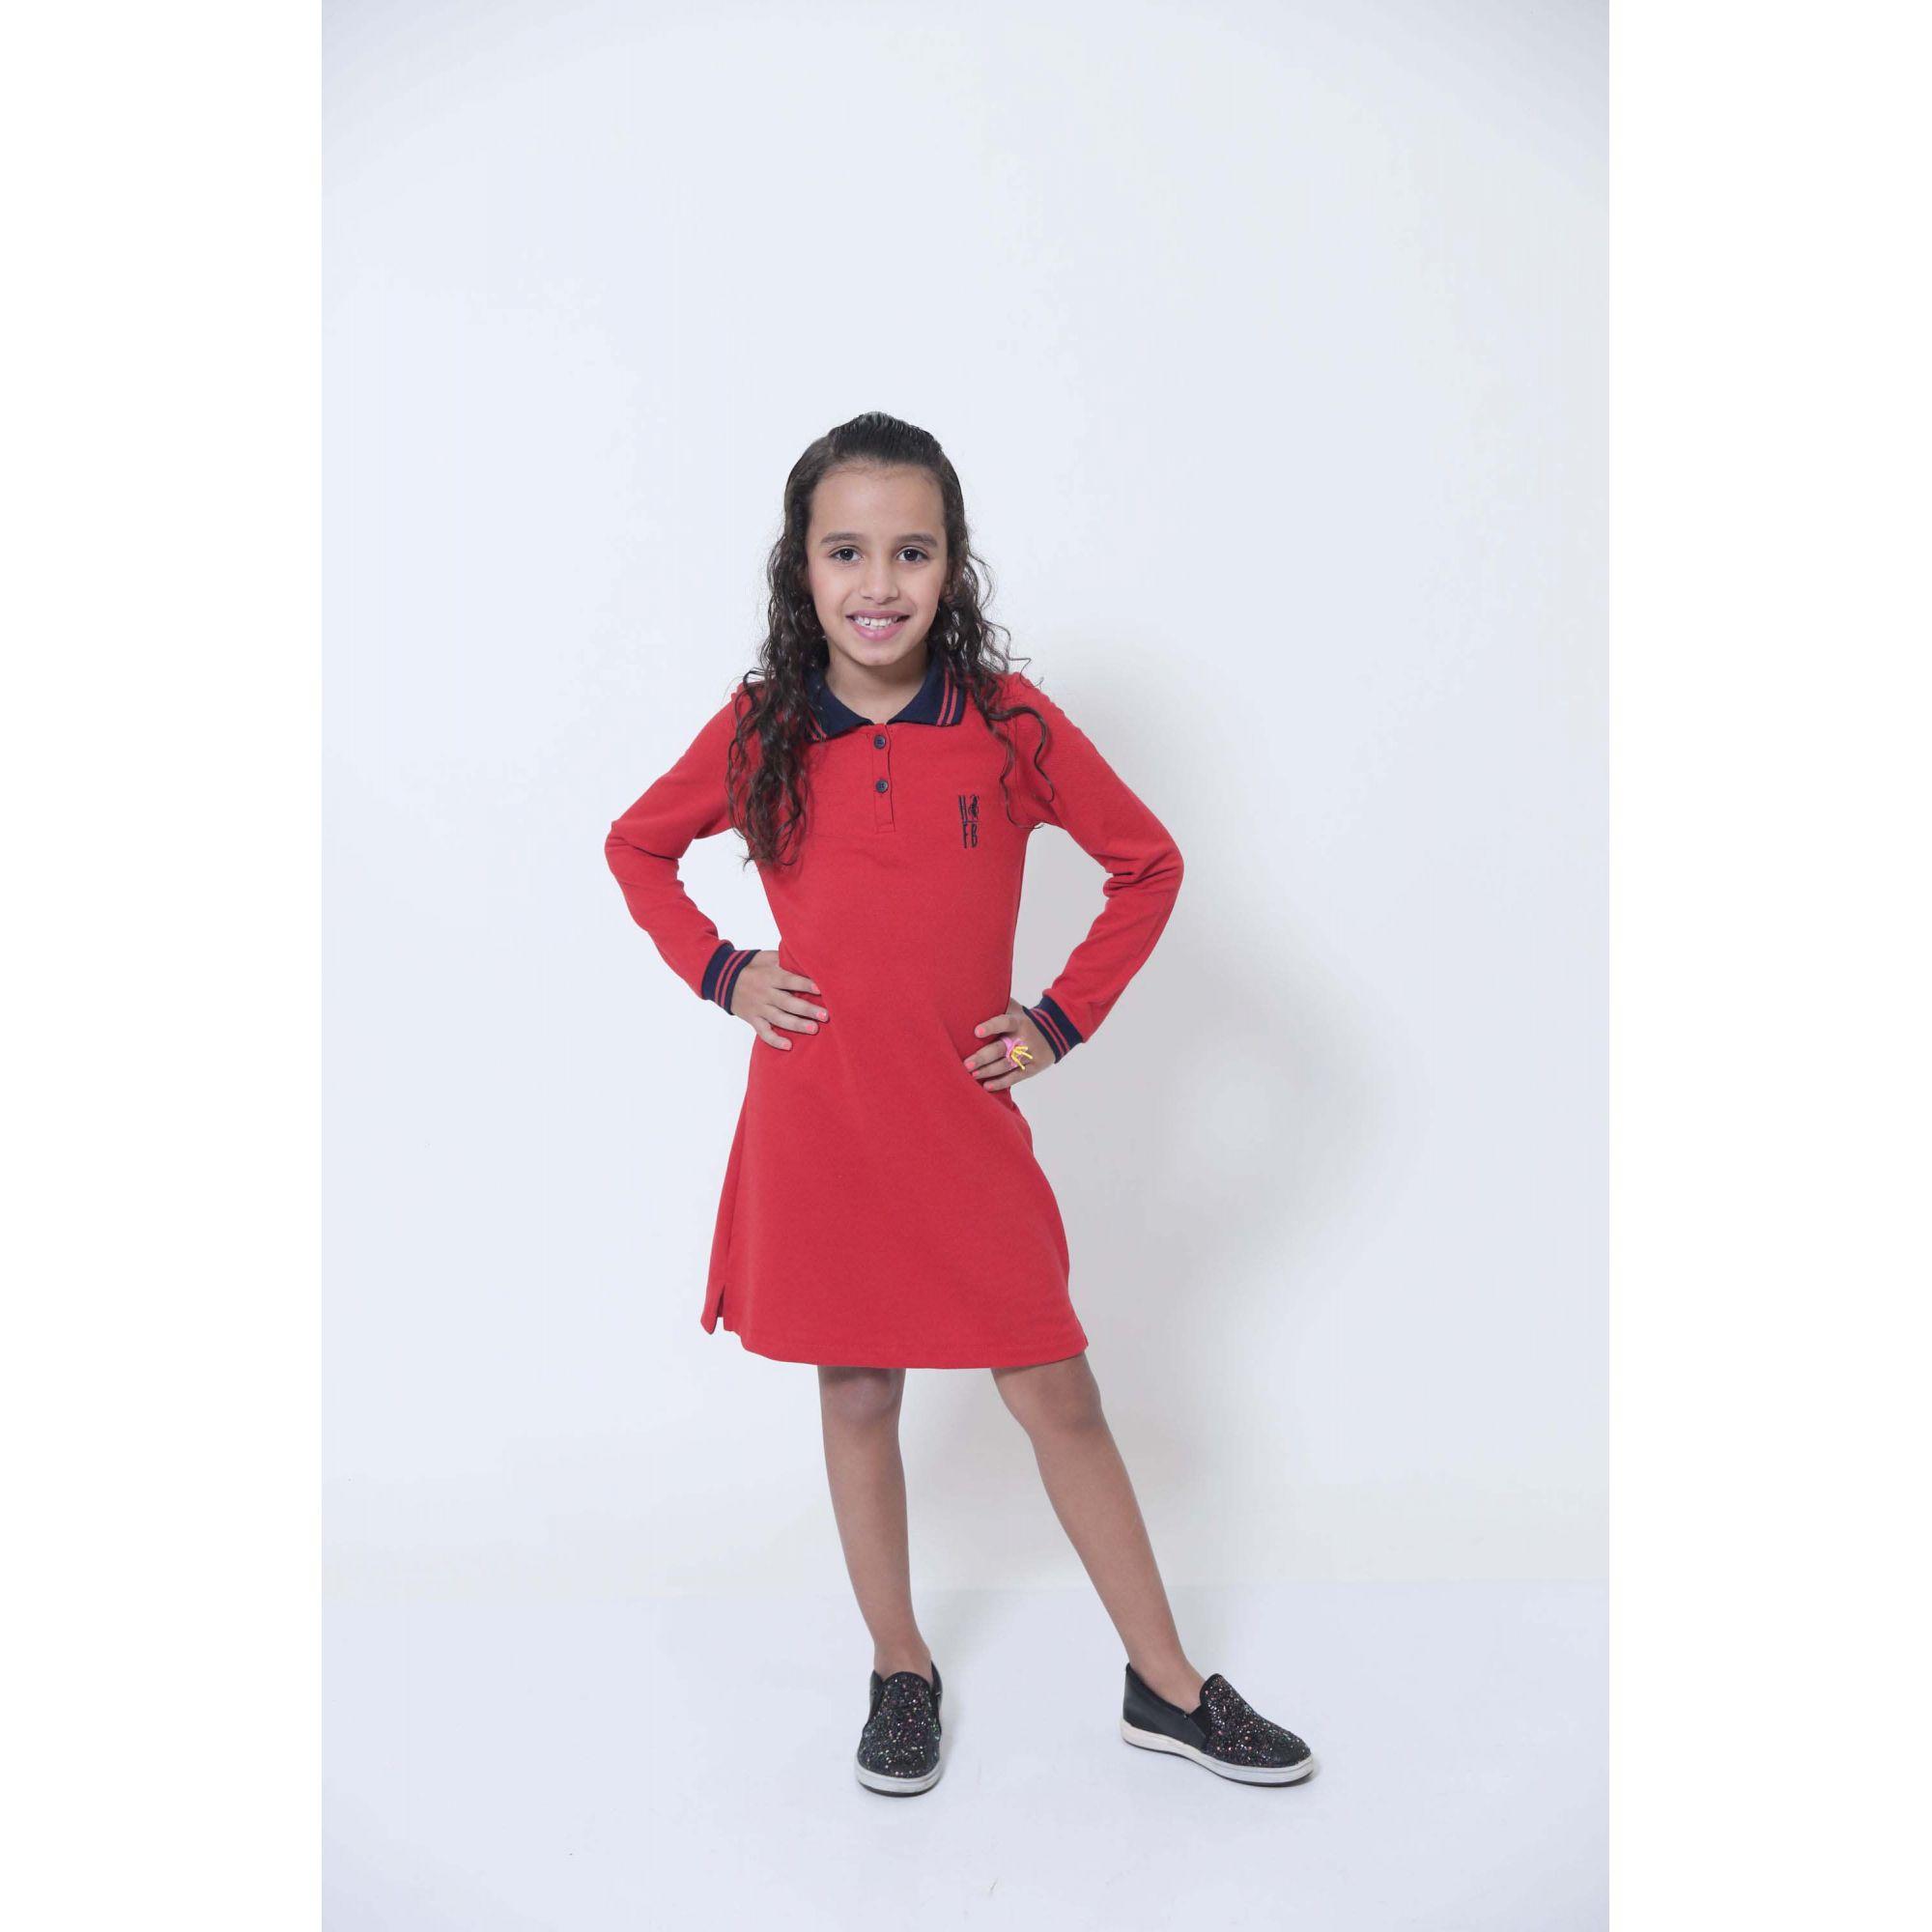 Vestido Polo Infantil Manga Longa Vermelho  - Heitor Fashion Brazil